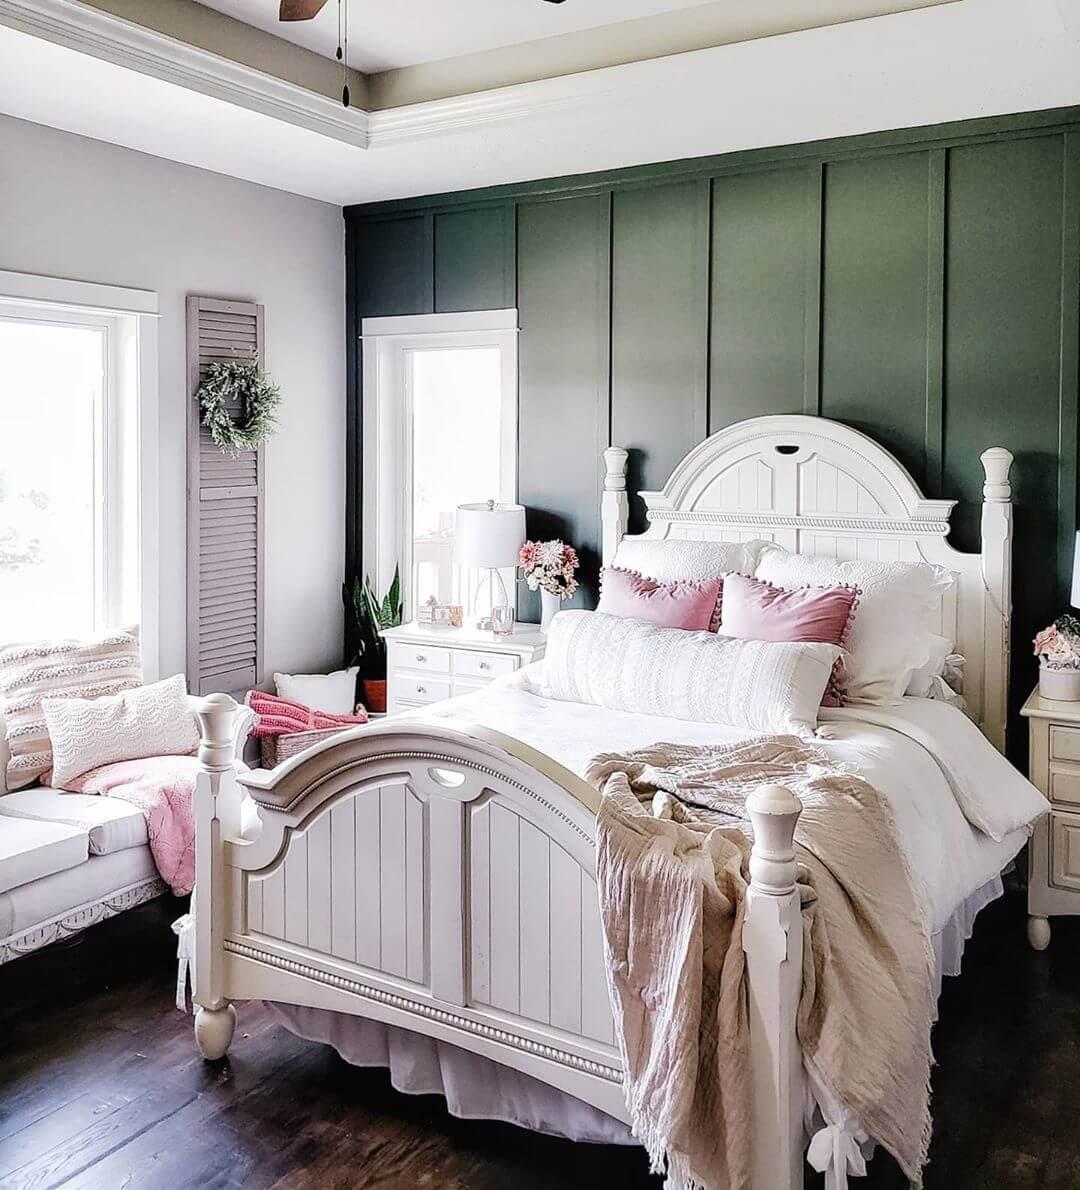 letto-stili-cottage